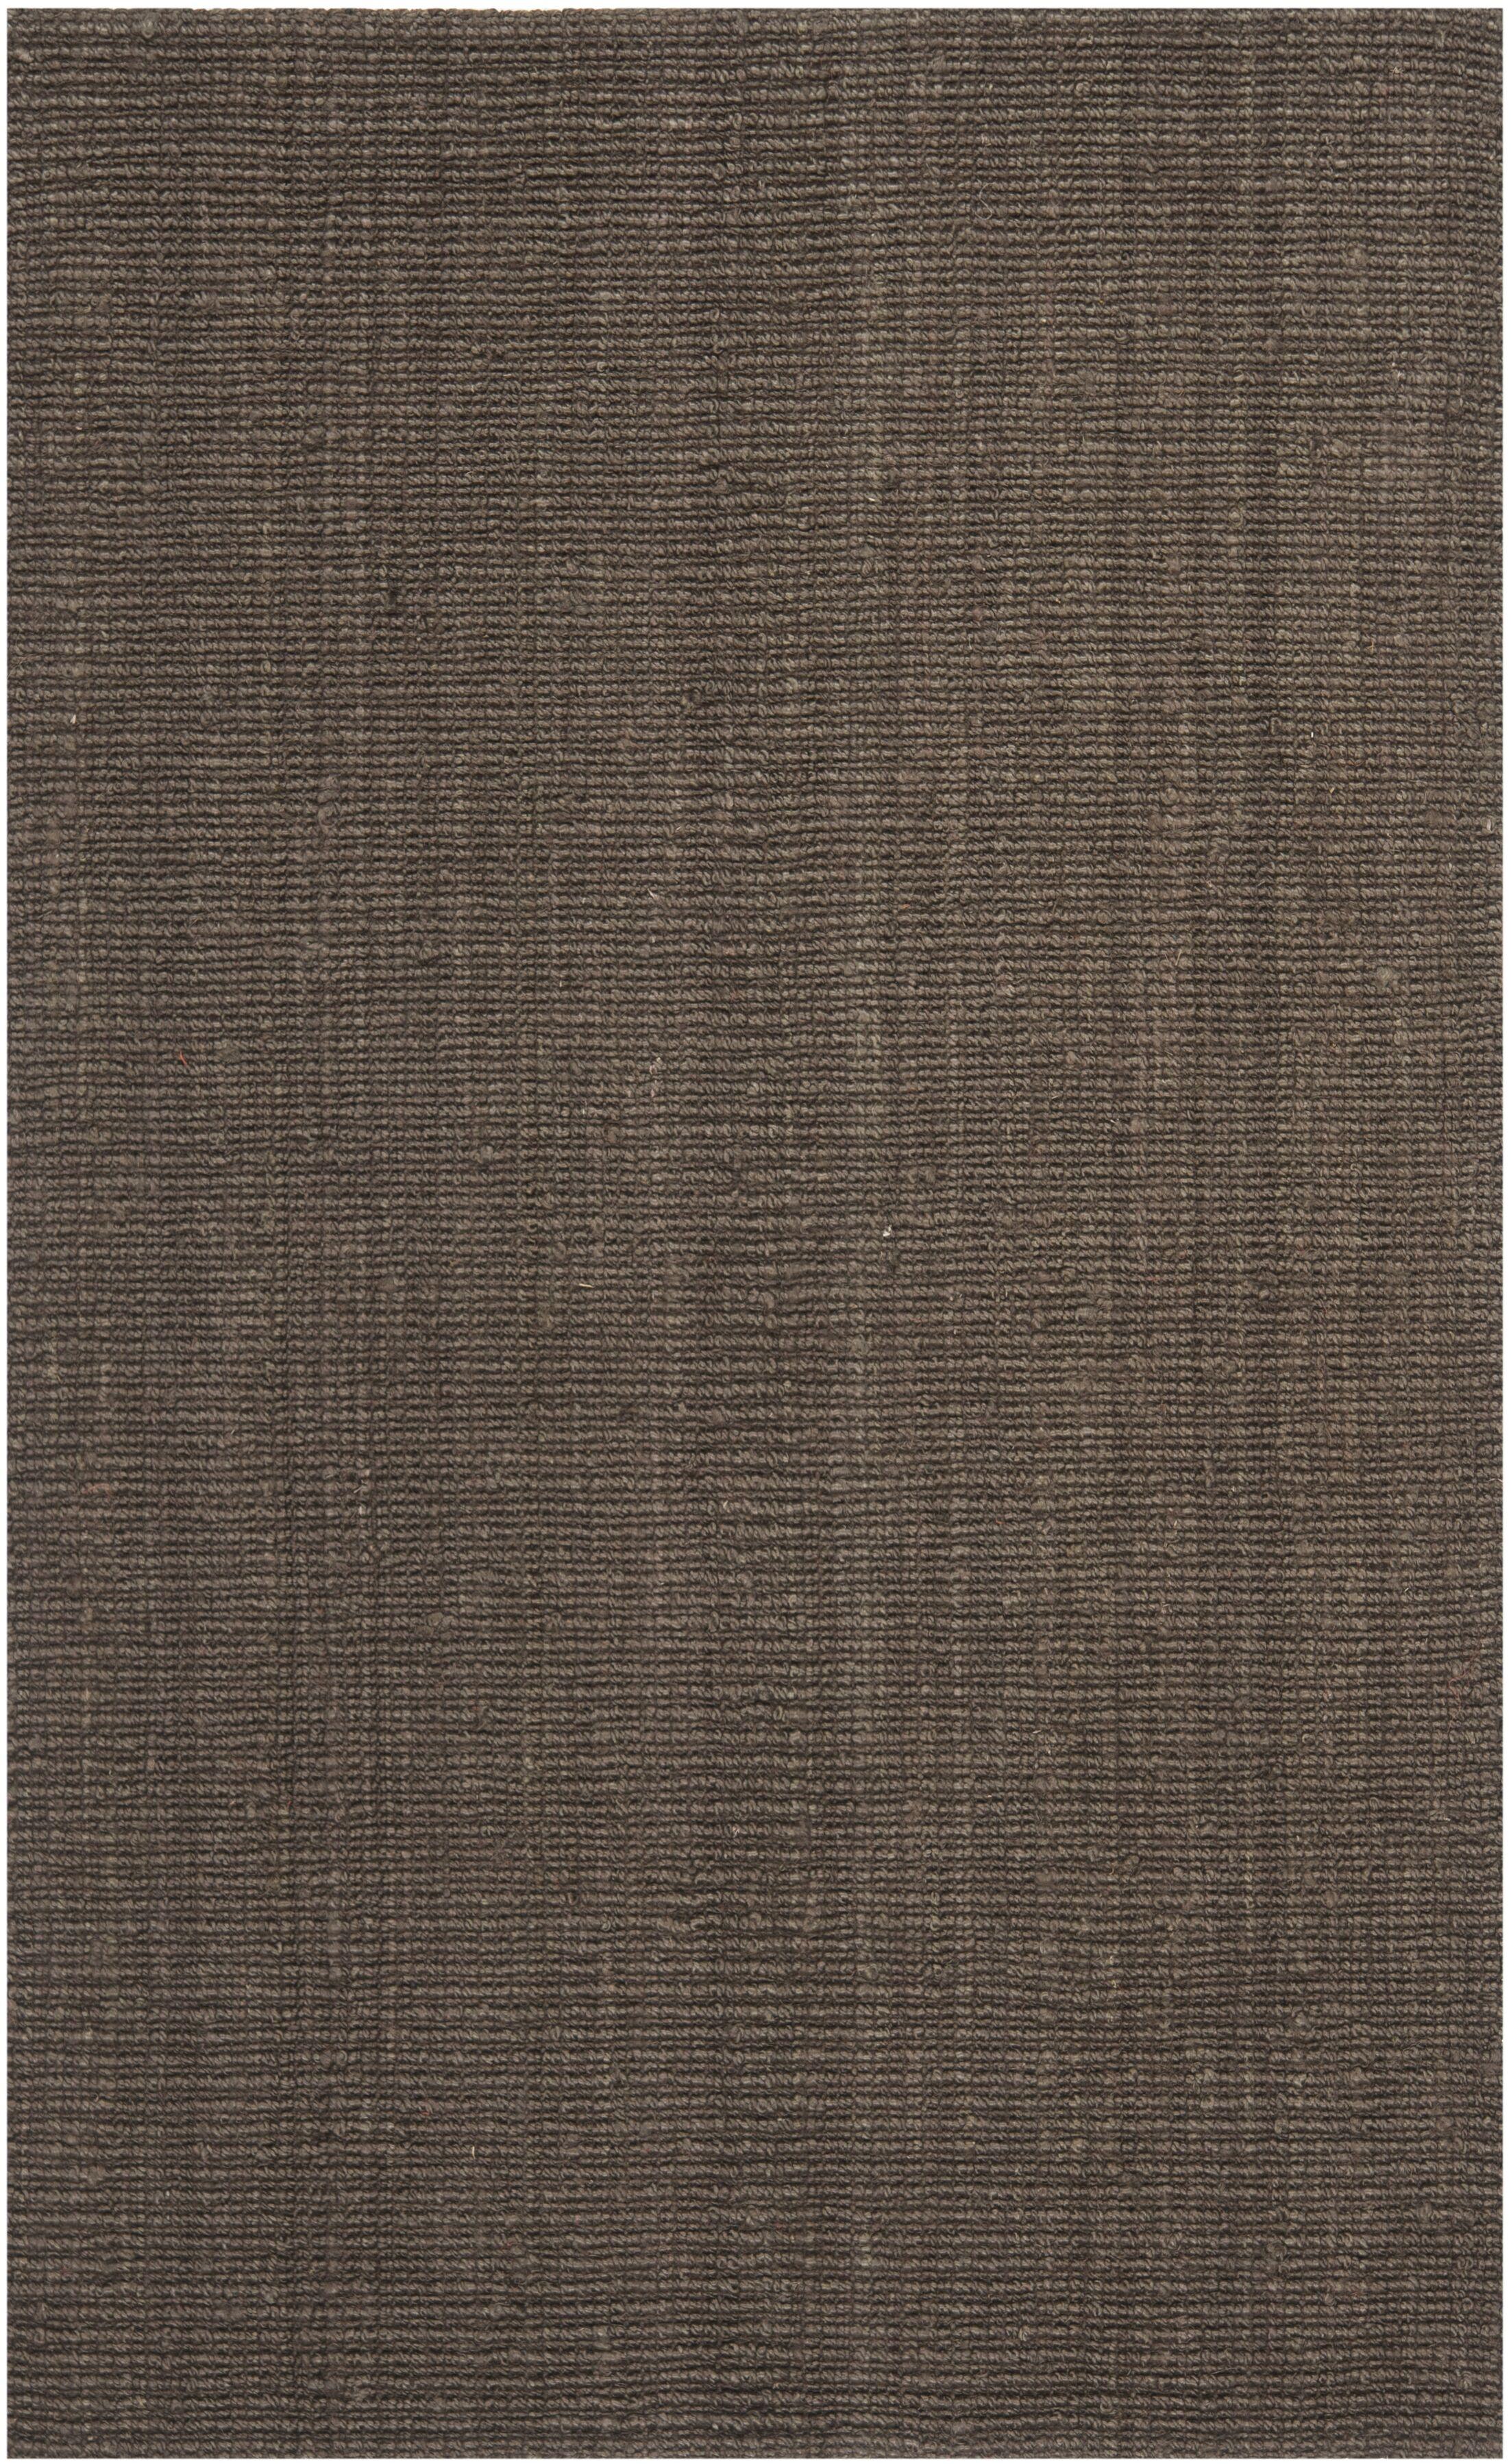 Cavanaugh Brown Area Rug Rug Size: Rectangle 4' x 6'